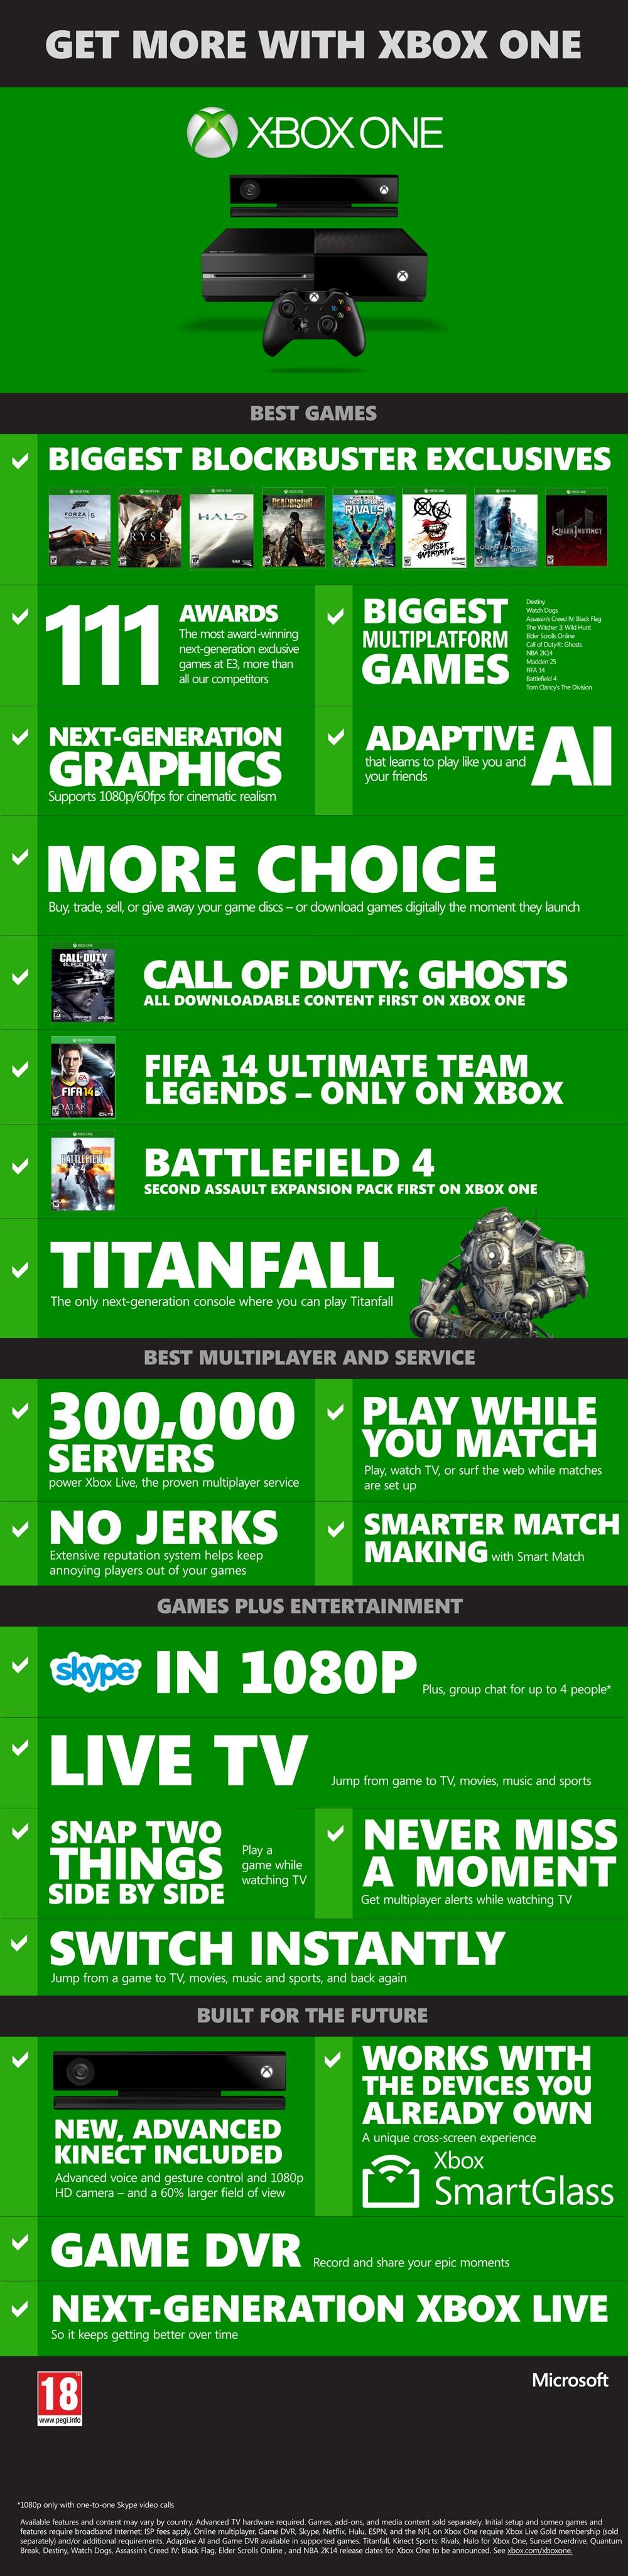 XboxOne_IFG_r8t5_cs